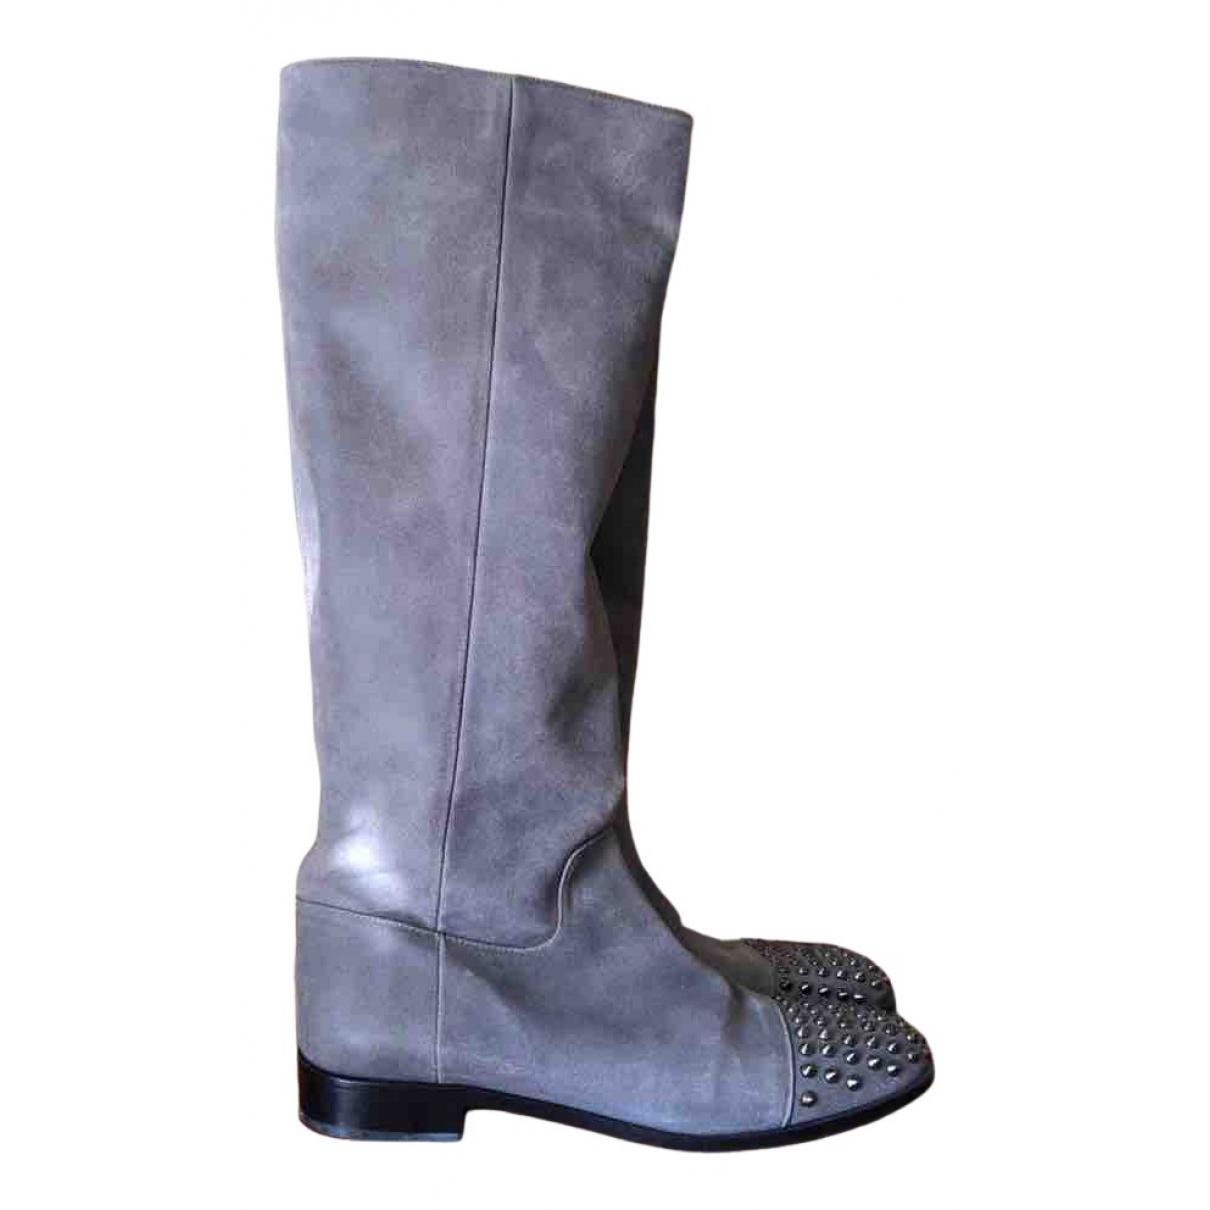 Patrizia Pepe \N Stiefel in  Grau Leder